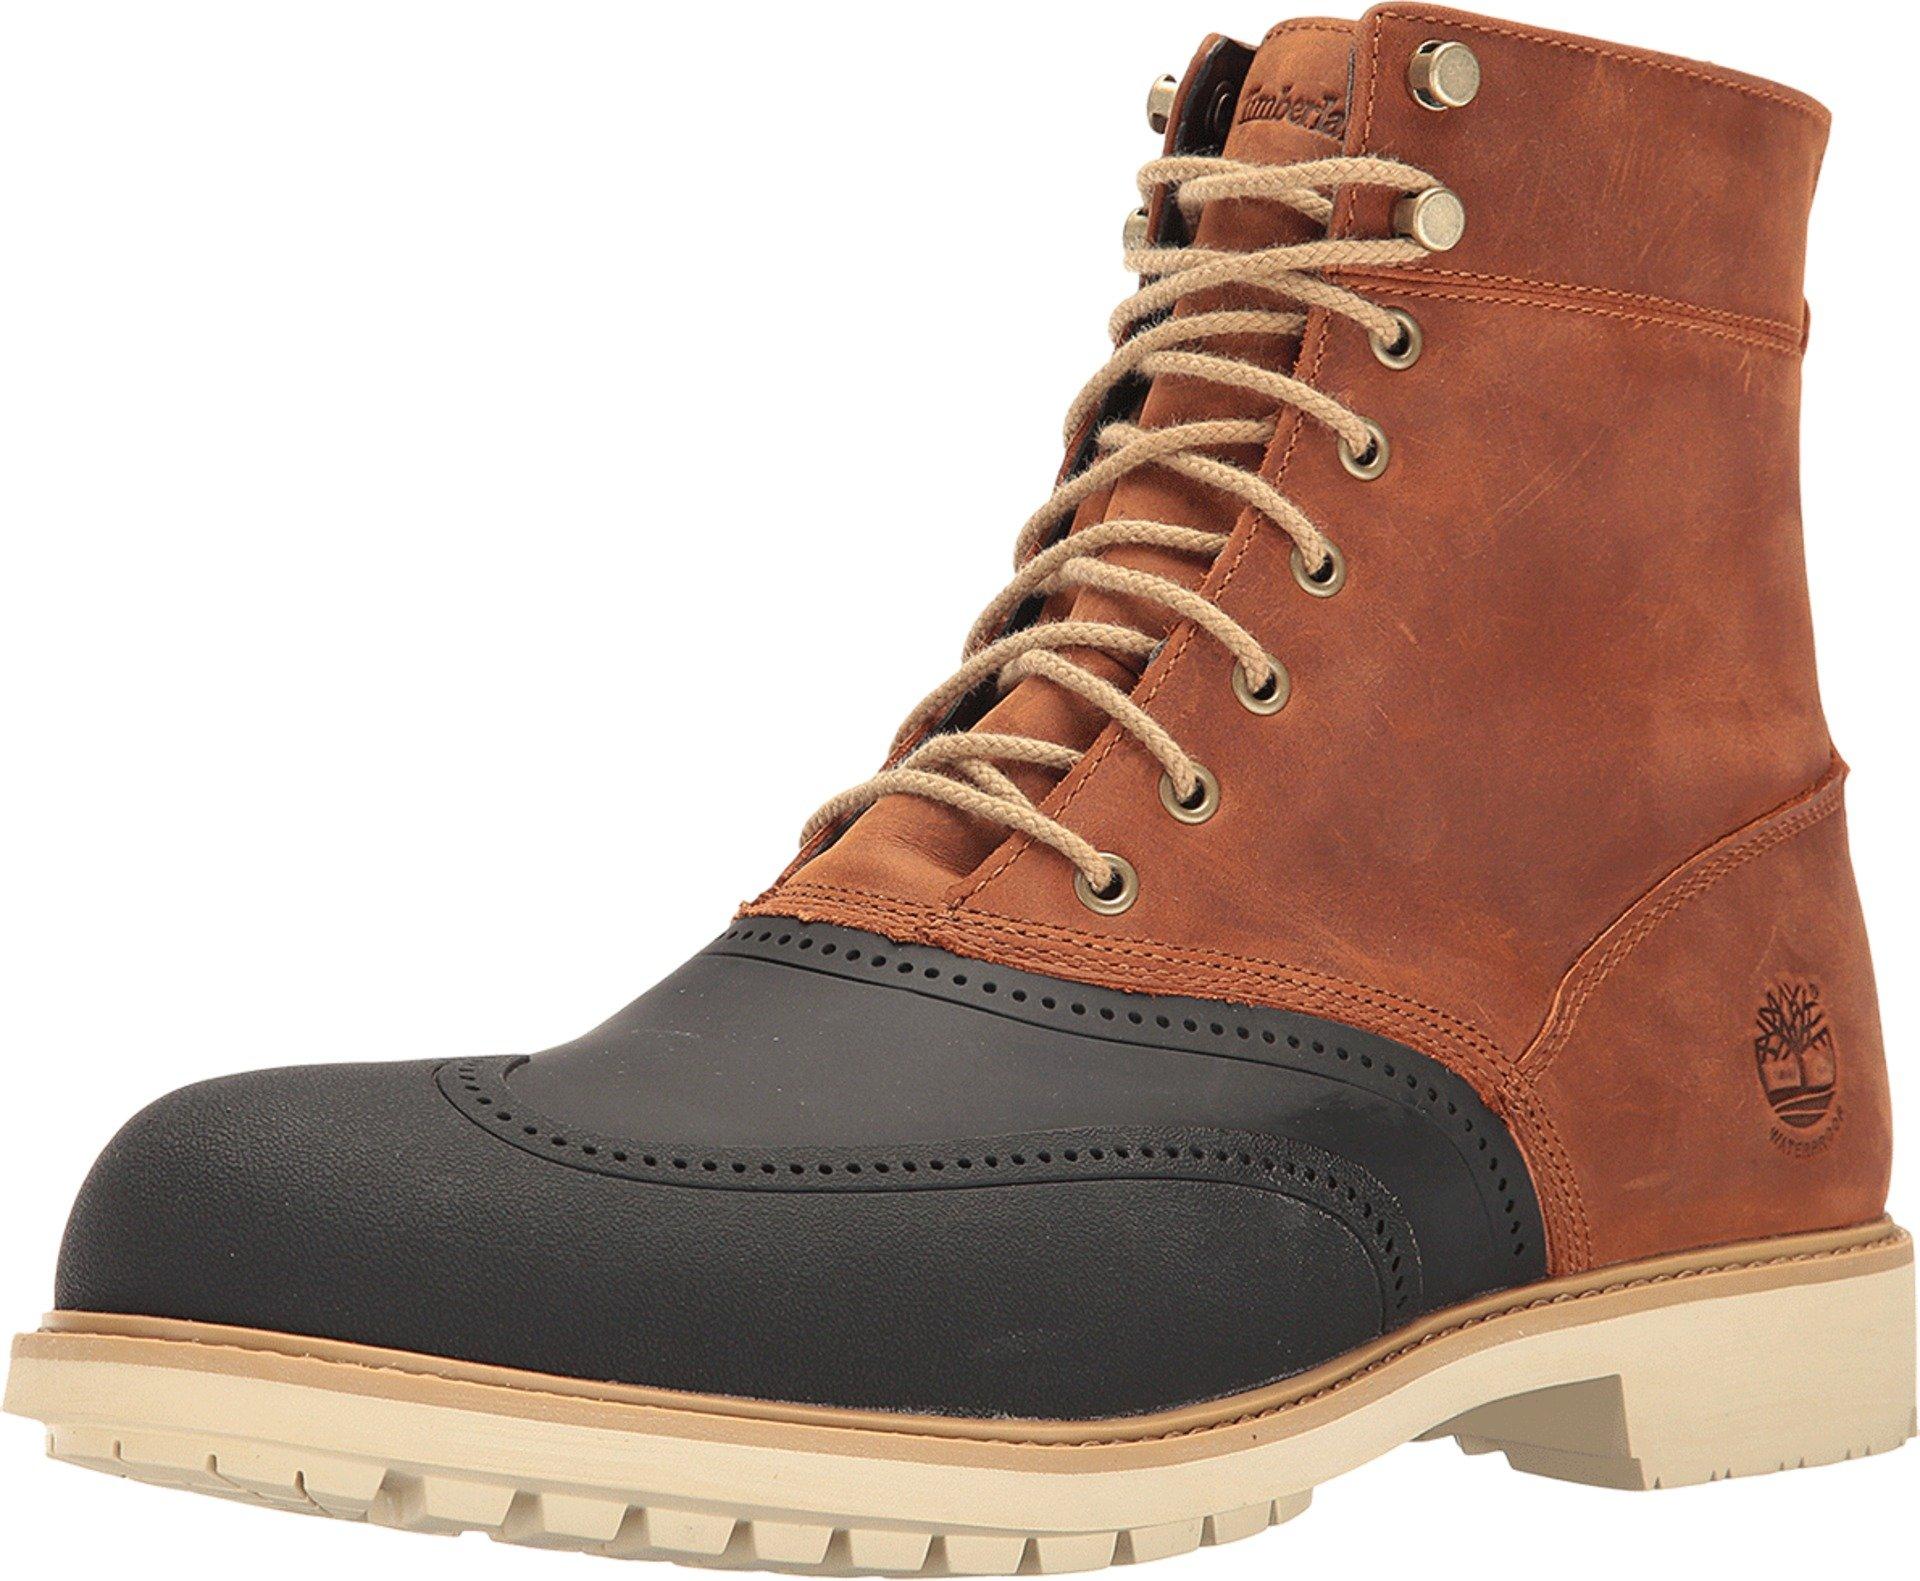 Timberland Men's Stormbuck Boot Brown Boot